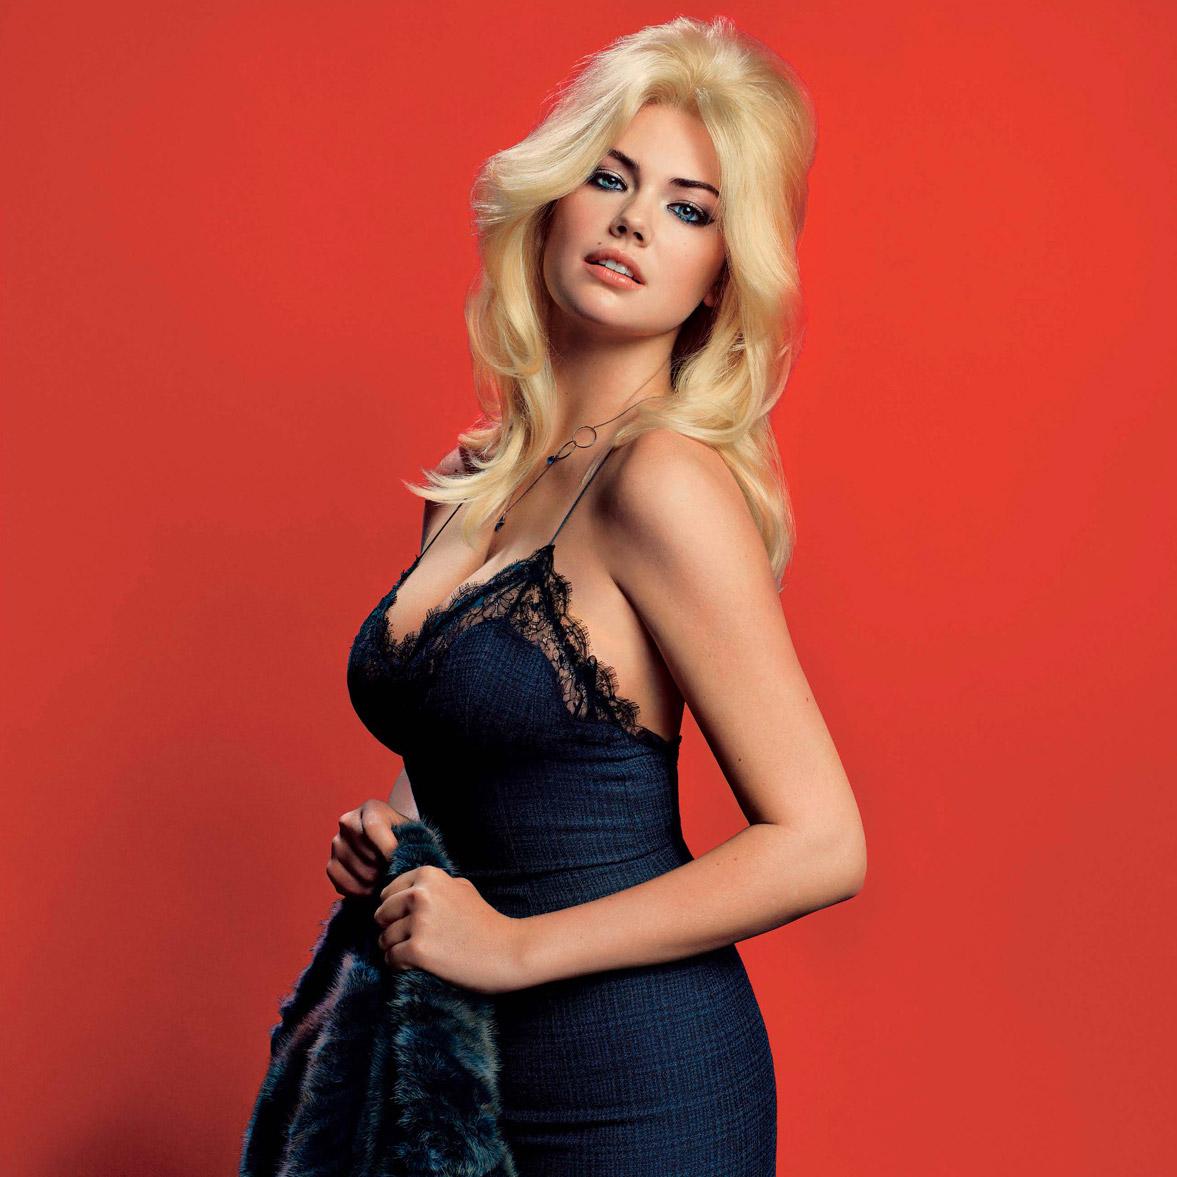 Кейт Аптон / Kate Upton by Inez & Vinoodh in V Magazine 87